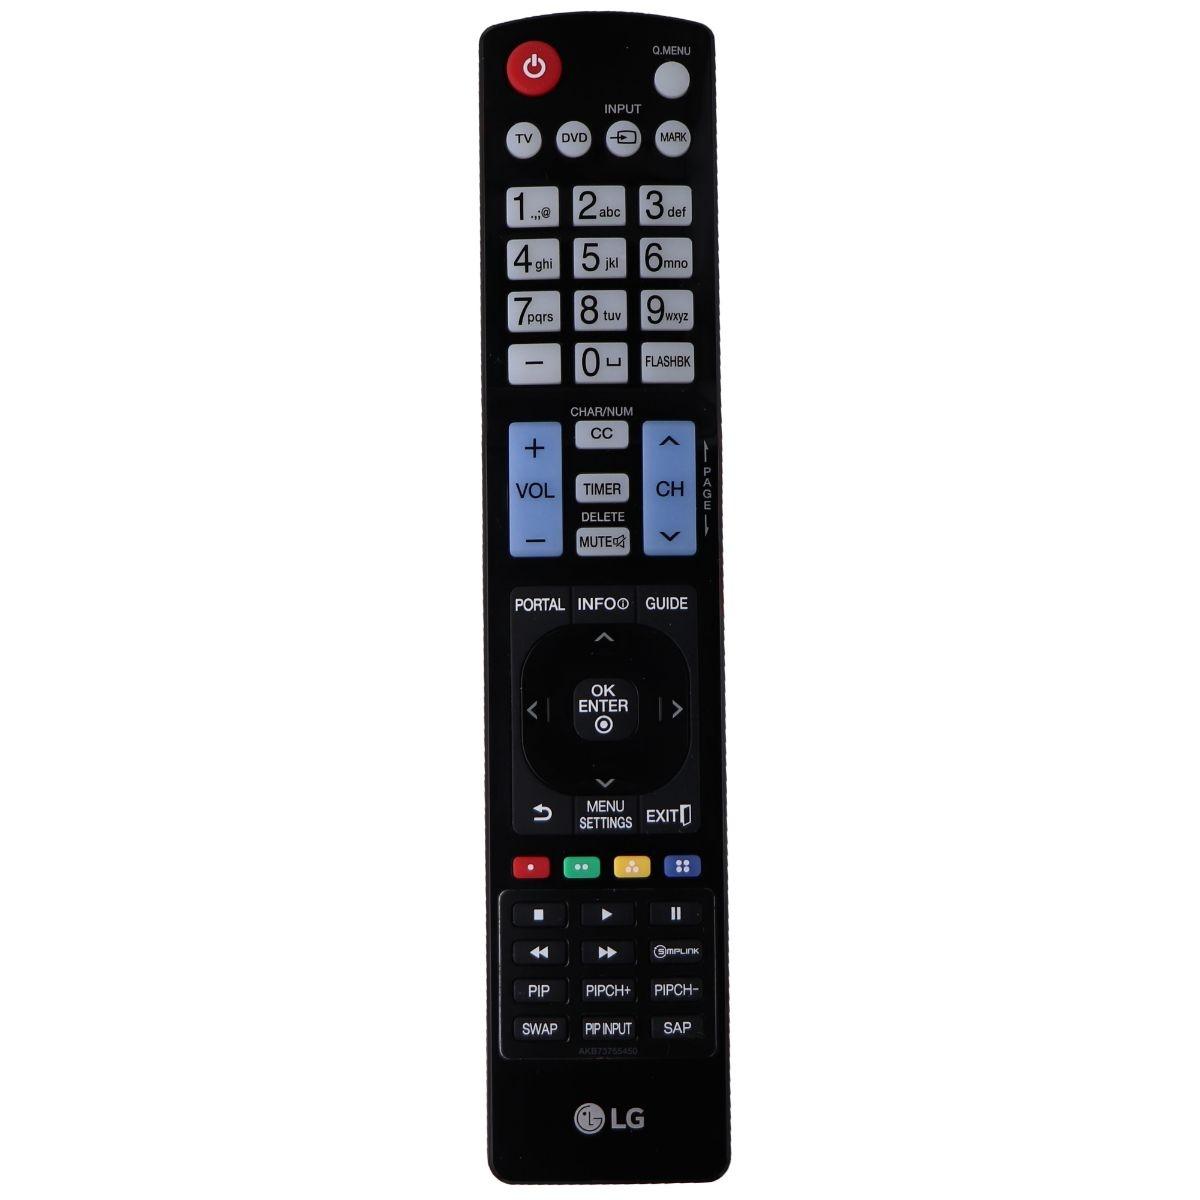 OEM Remote - LG AKB73755450 for Select LG TVs